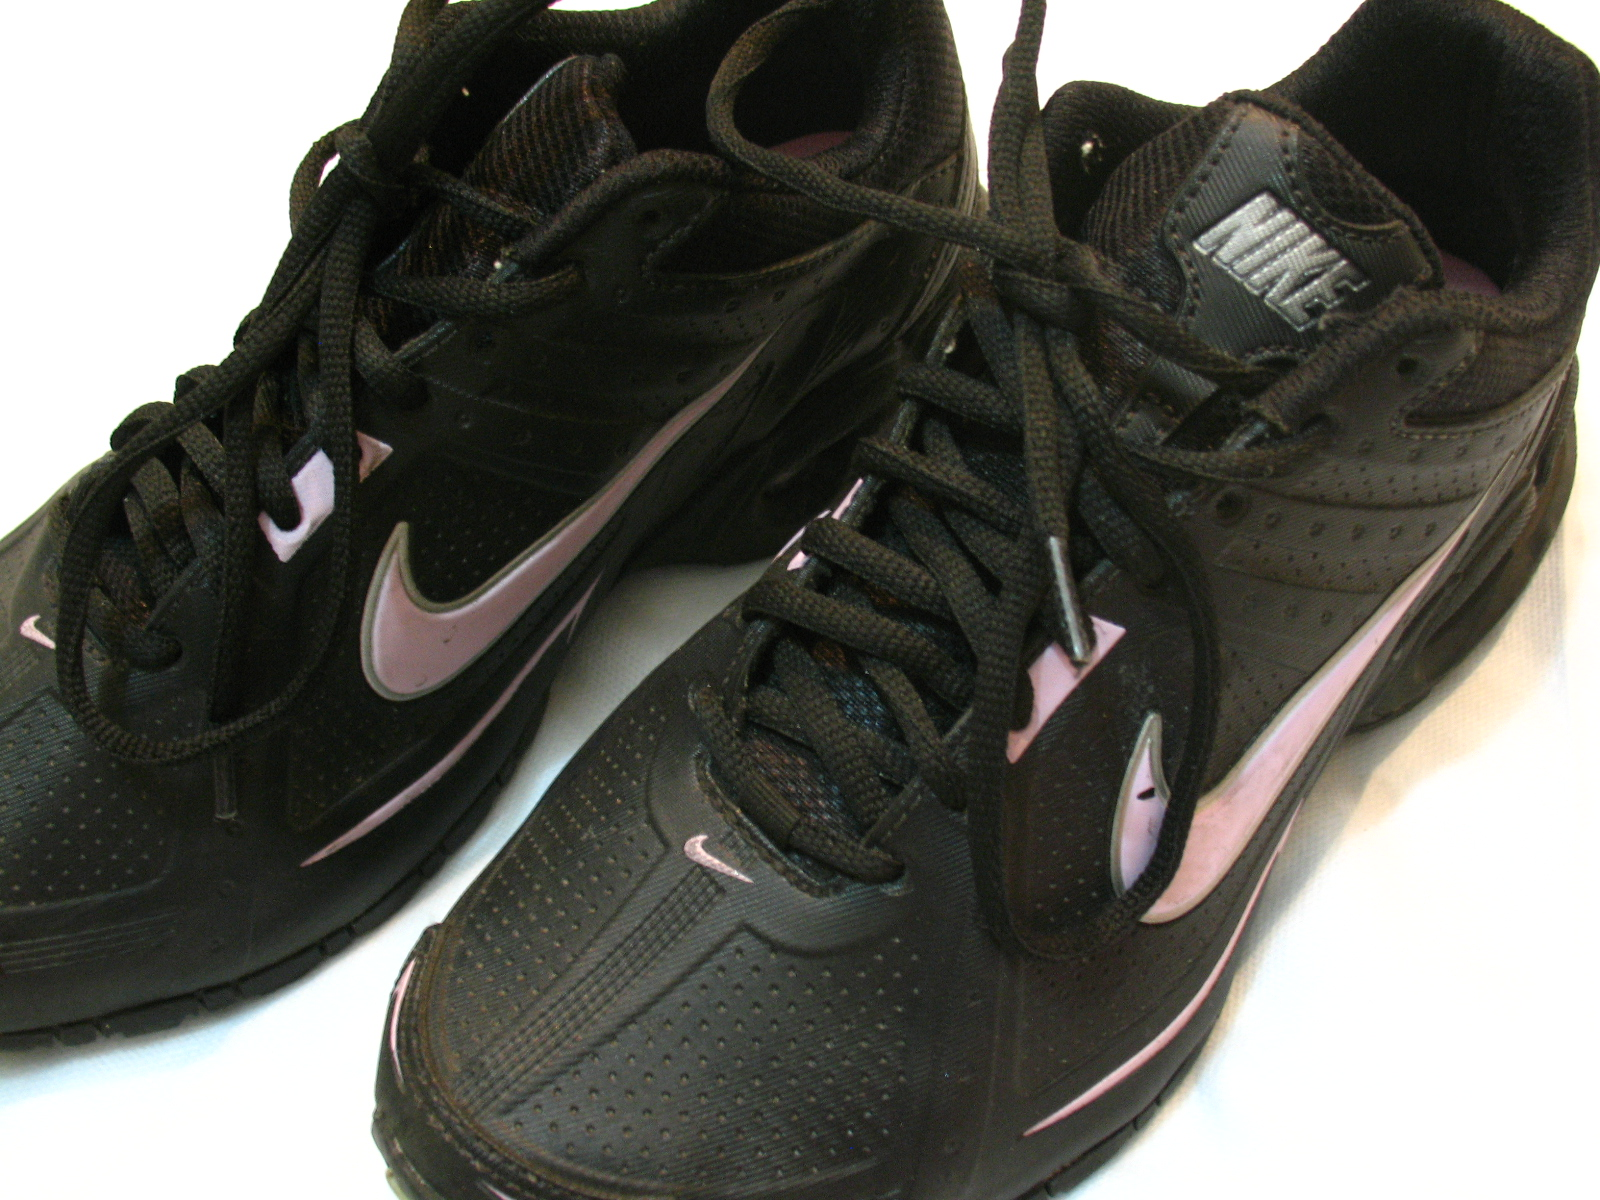 e0ffbe36053 Tudo Brechó  Tenis Feminino Nike - Modelo  Air Max Spear